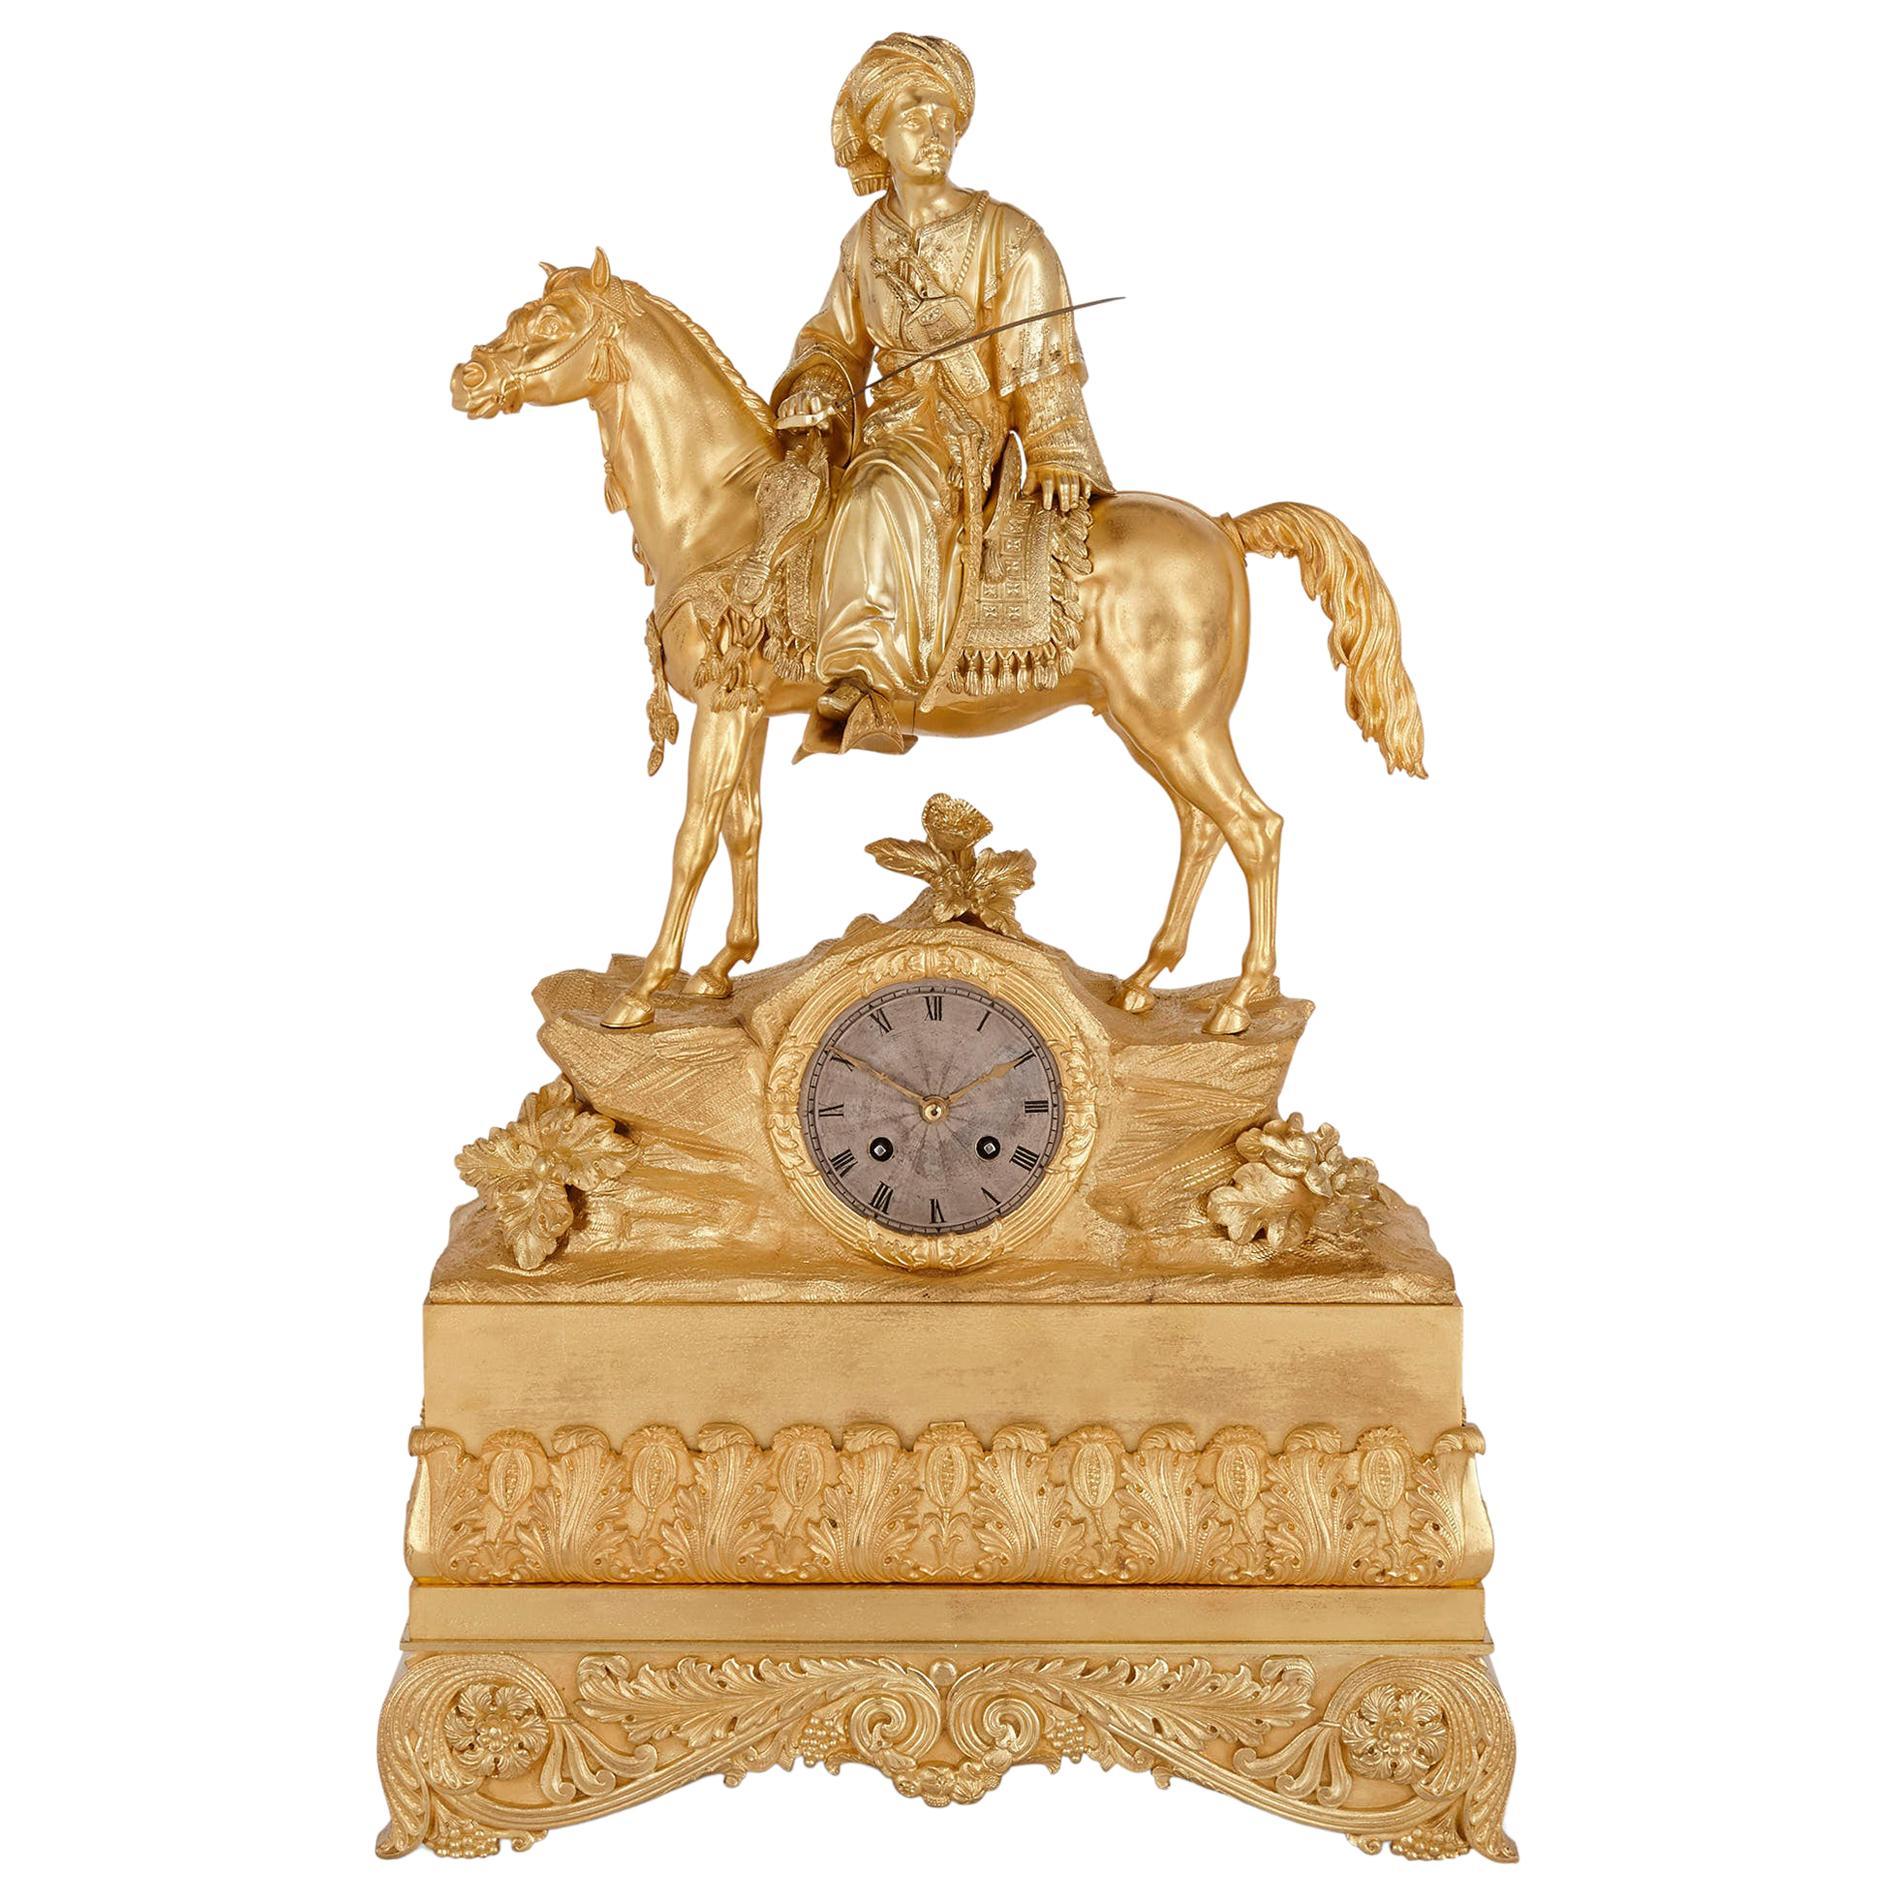 French Orientalist Gilt Bronze Equestrian Mantel Clock